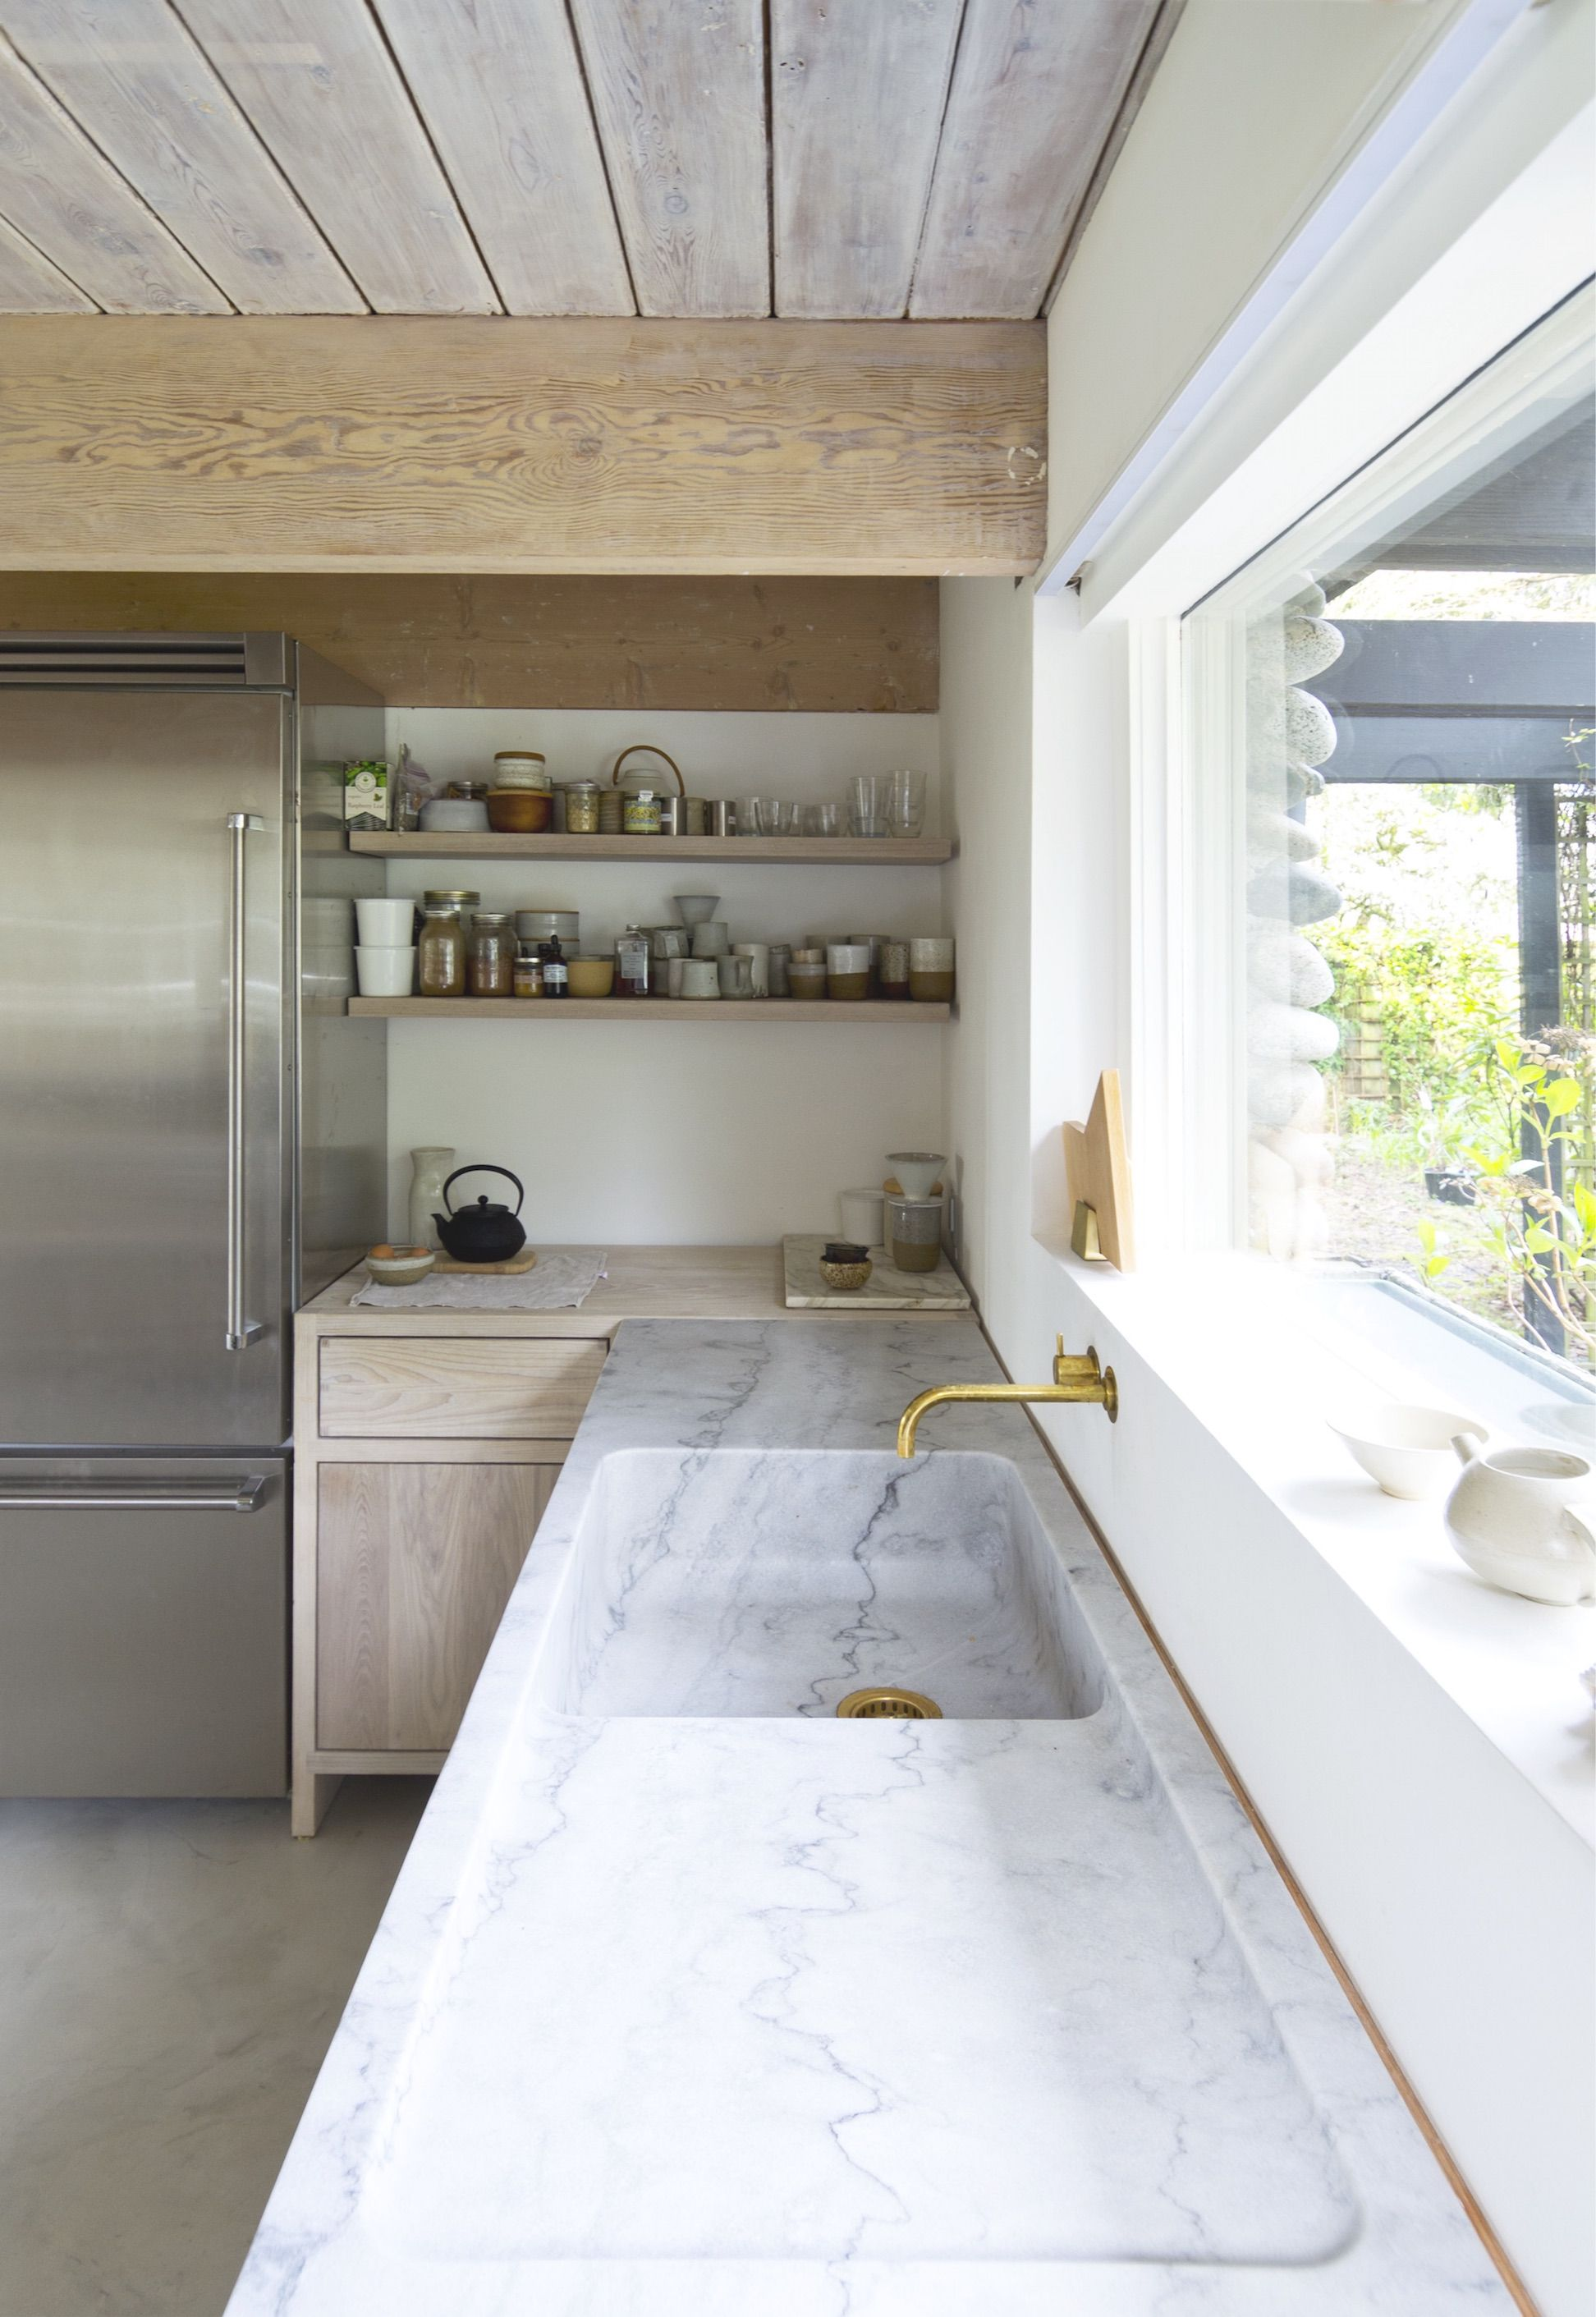 Kitchen of the Week: A Monumental Marble Countertop | Küche, Wohnen ...